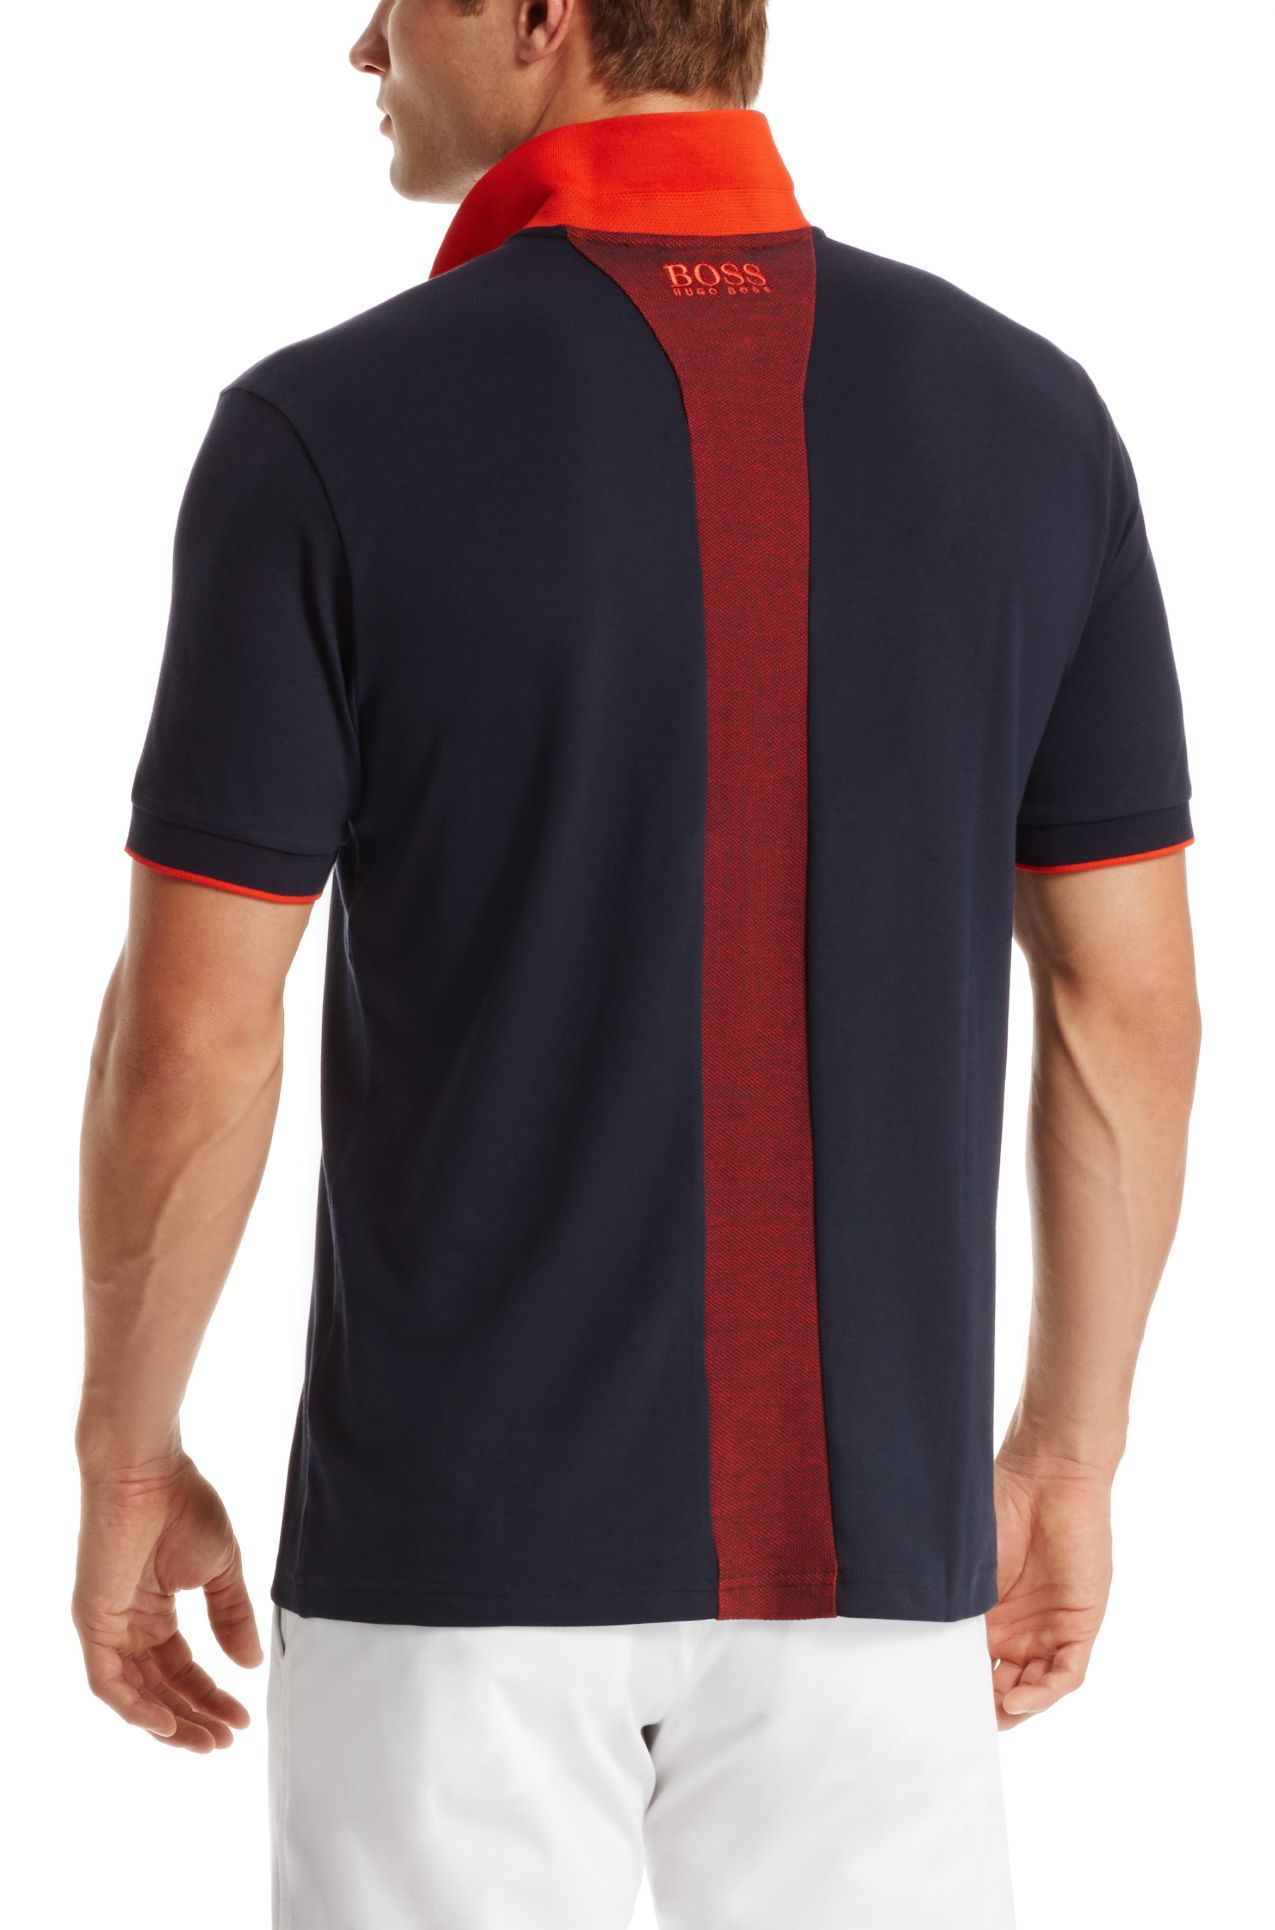 48329e352 'Paddy MK' | Modern Fit, Moisture Manager Stretch Cotton Blend Polo Shirt ,  Dark Blue